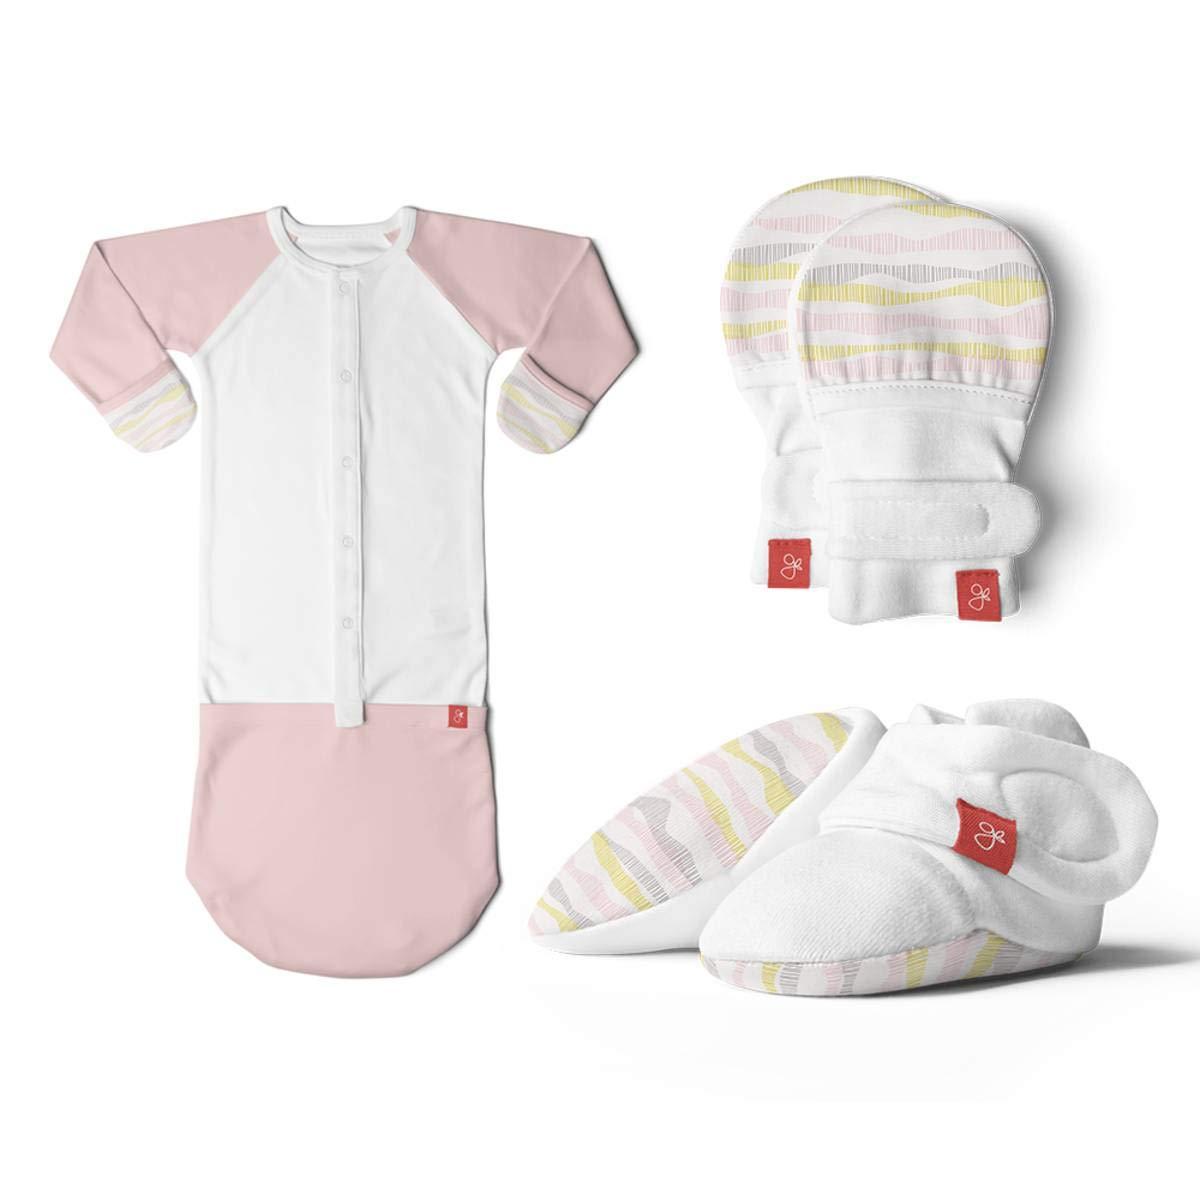 Newborn Baby Mittens, Booties & Sleep Sack Pajamas Bundle, Organic, Soft & Adjustable (Geo Wave Pink, 0-3 Months) by goumikids